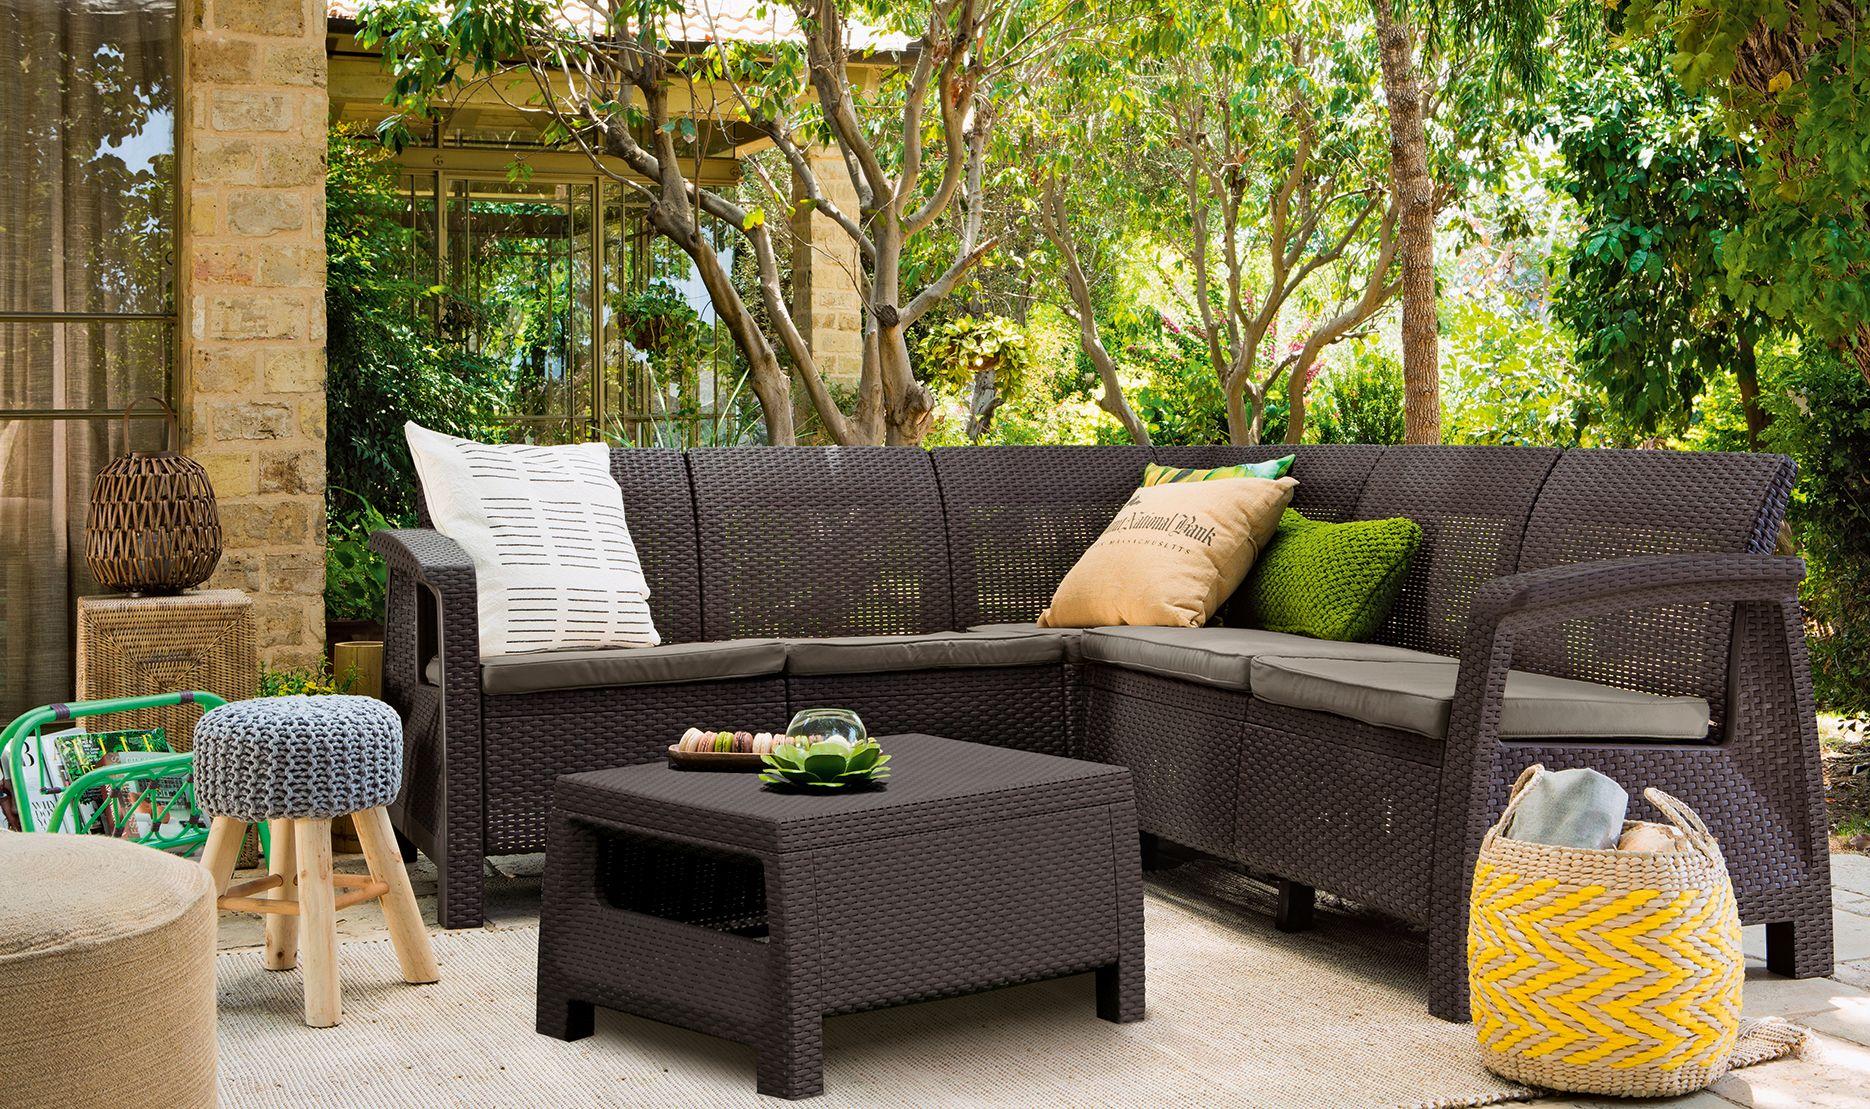 Corfu Relax set Műrattan kerti garnitúra Kerti bútorok